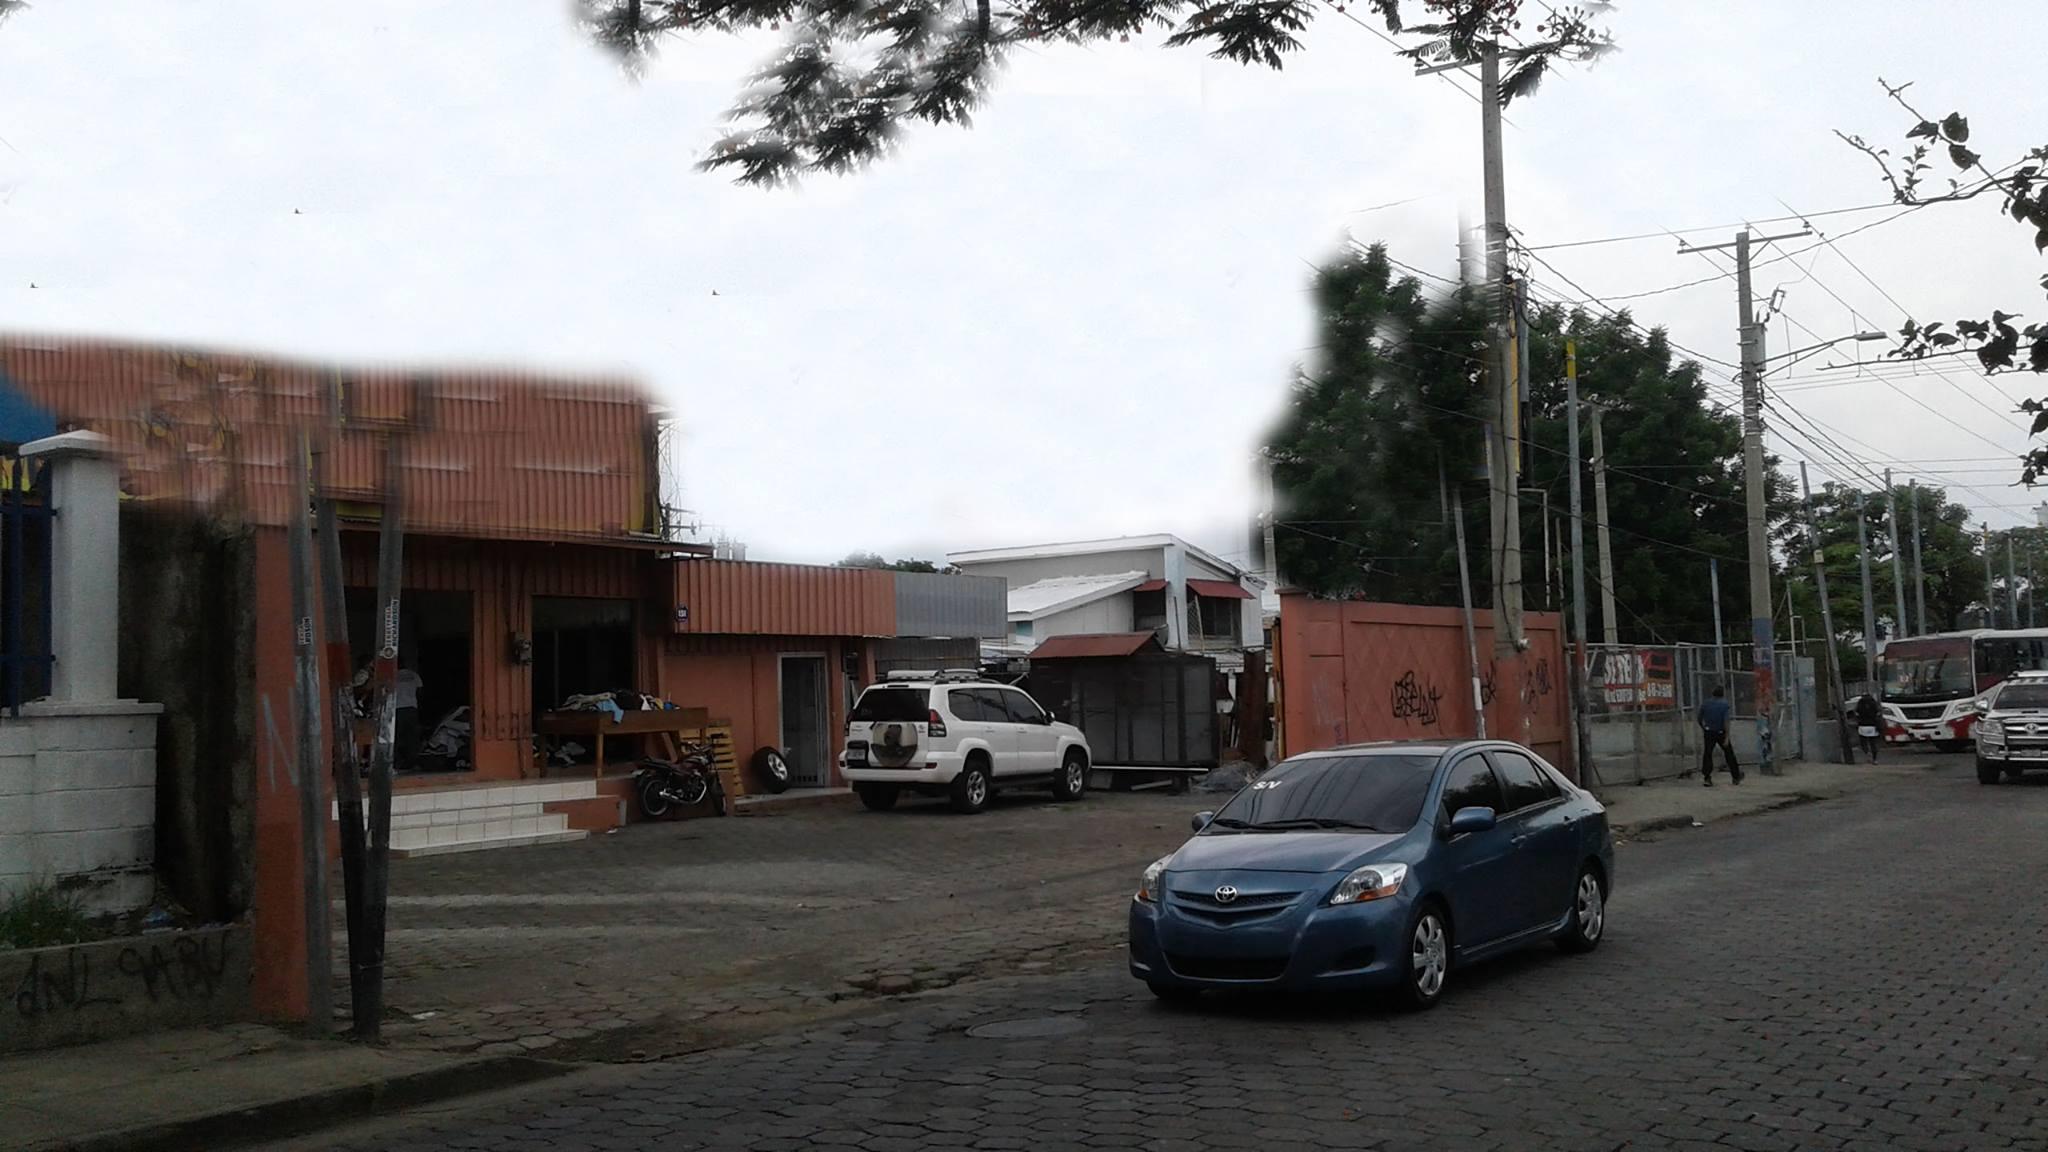 carretera-norte-kmc-bienes-raices-9342335 (13)